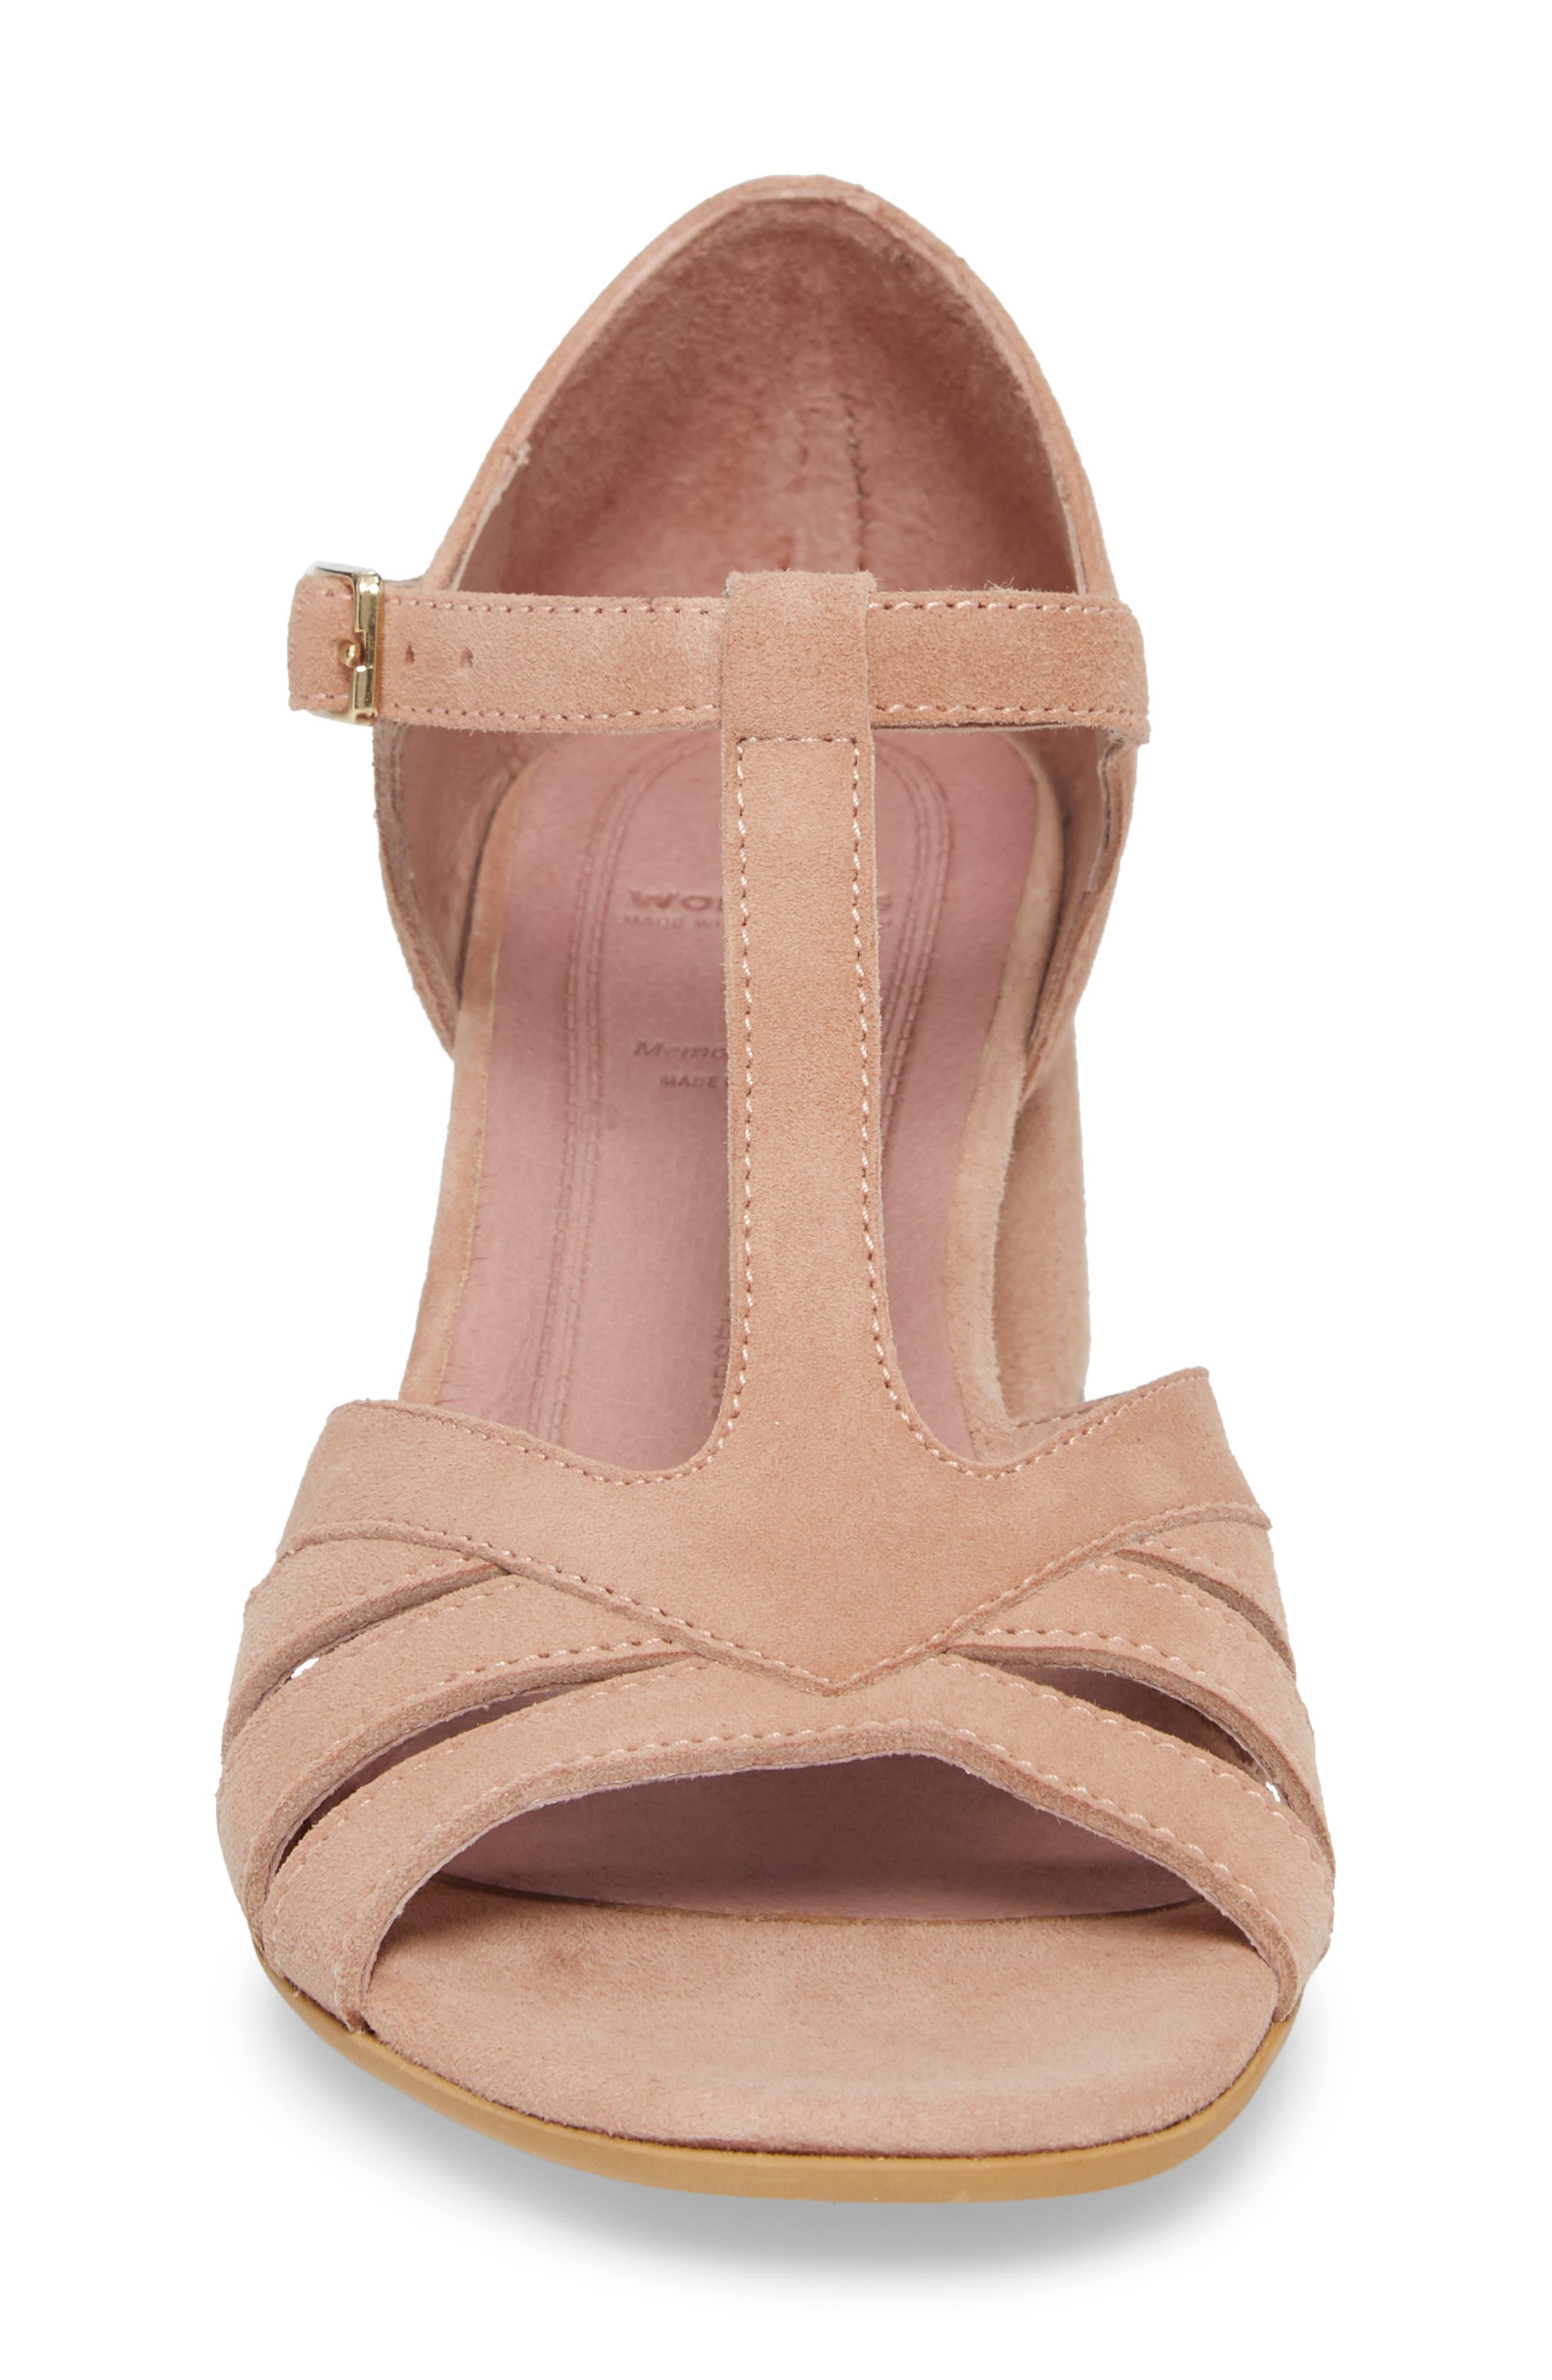 Block Heel Sandal,                             Alternate thumbnail 4, color,                             Nude Suede